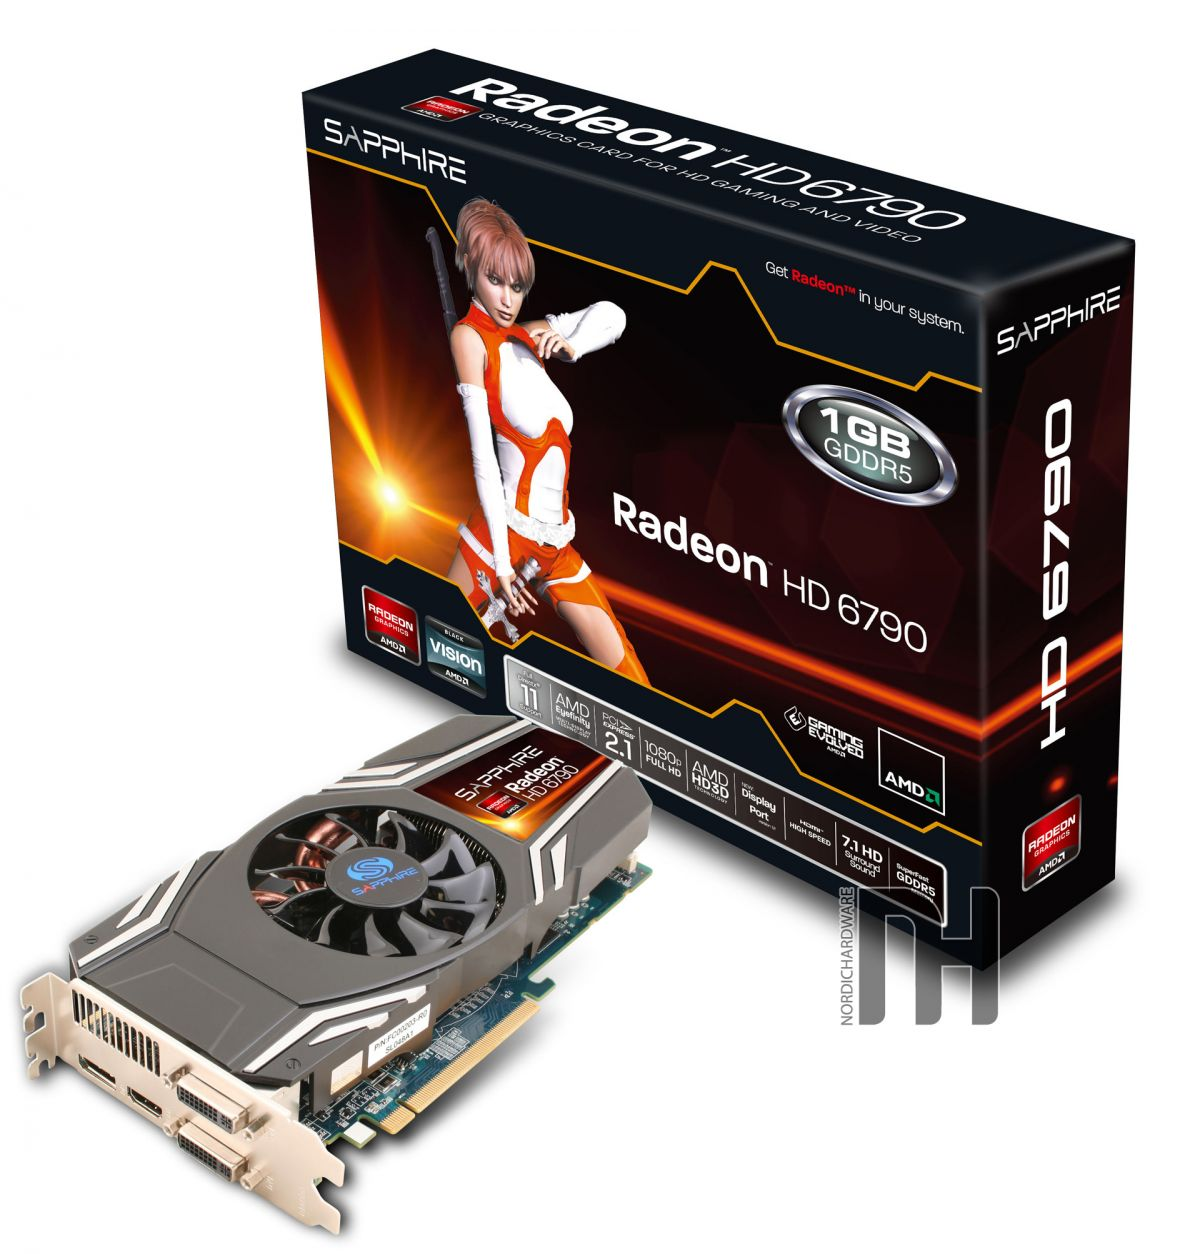 Sapphire Radeon HD 6790 (nordichardware.com)